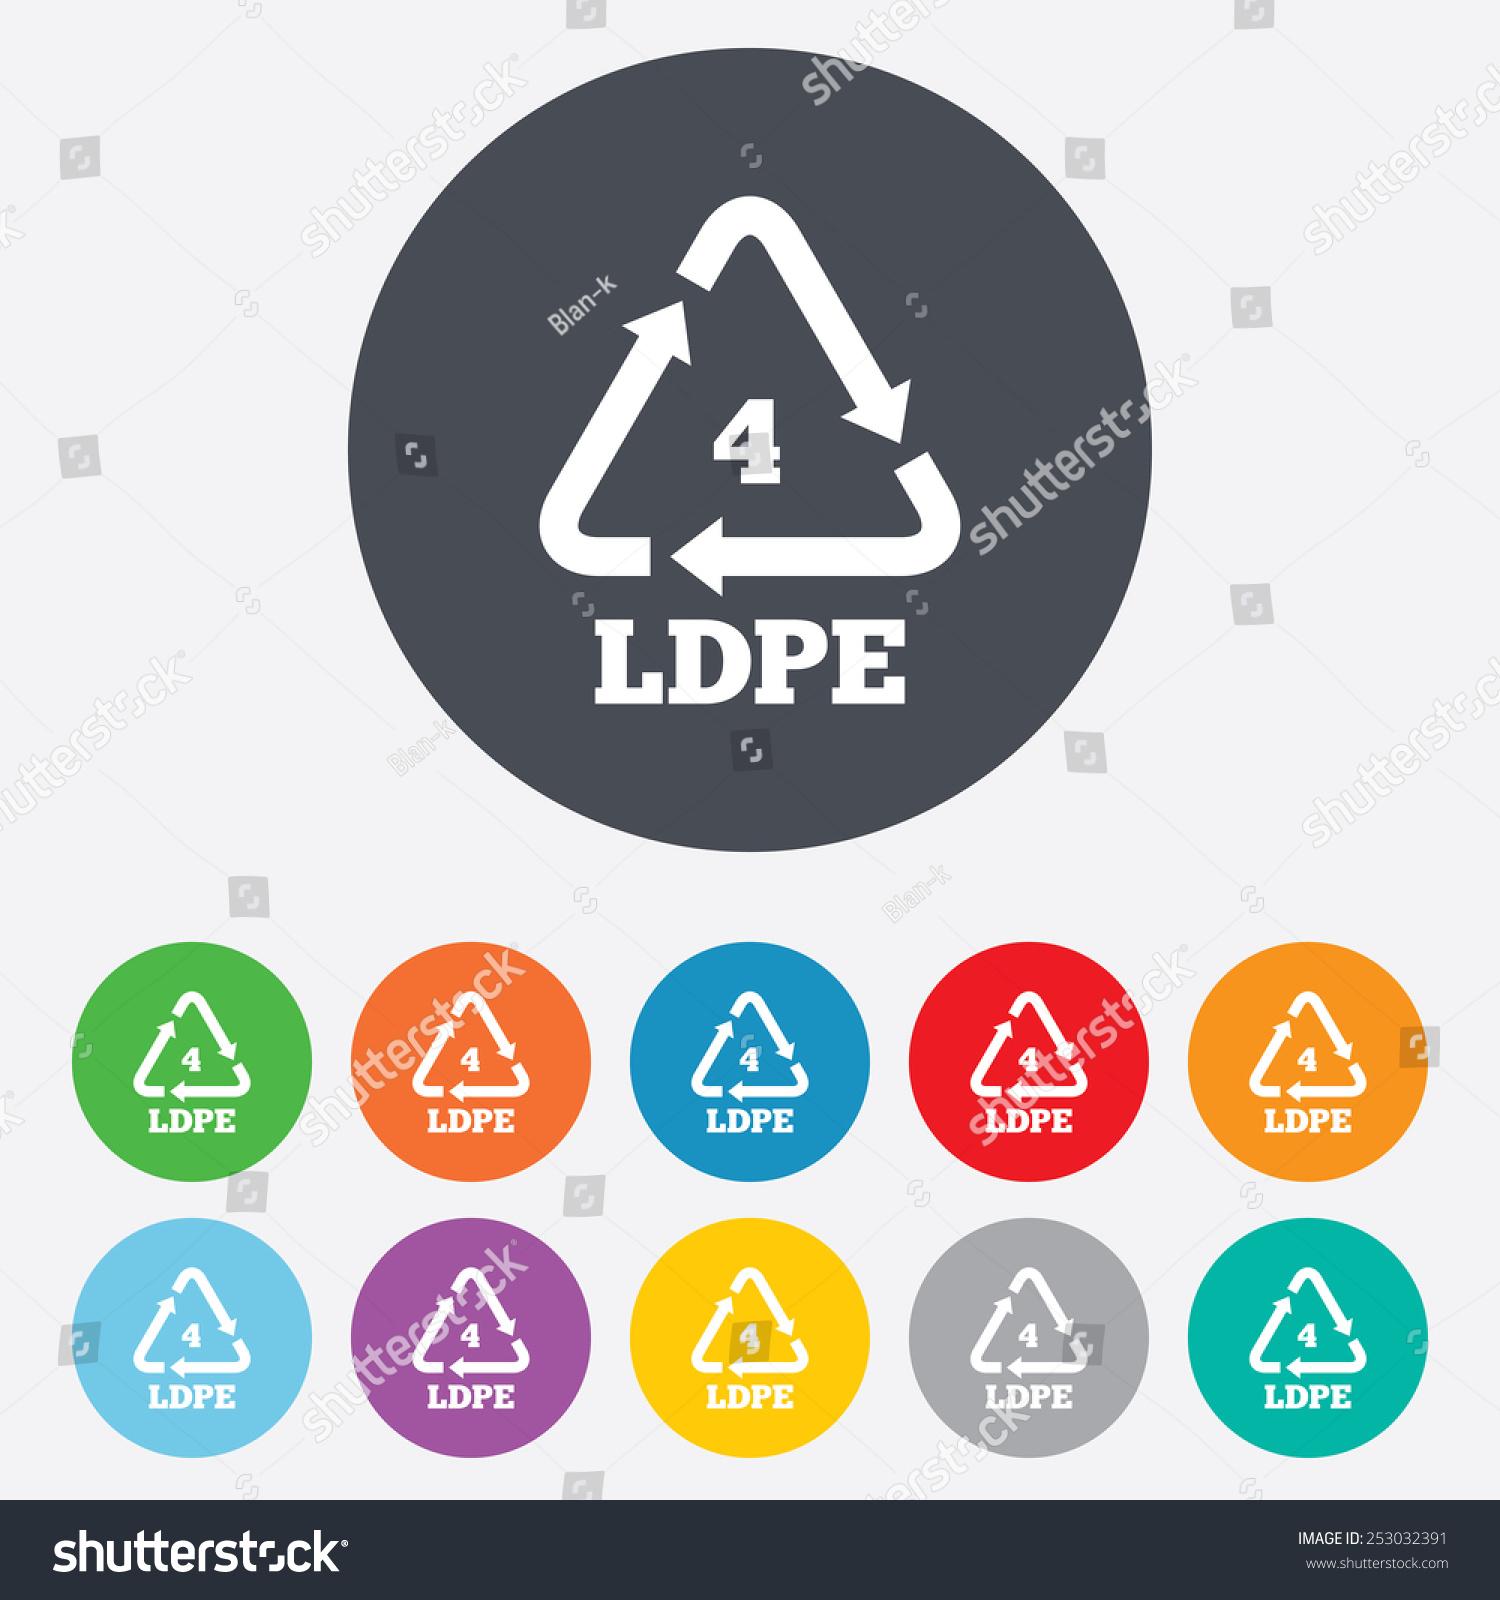 Ldpe 4 icon lowdensity polyethylene sign stock vector 253032391 ld pe 4 icon low density polyethylene sign recycling symbol round biocorpaavc Choice Image